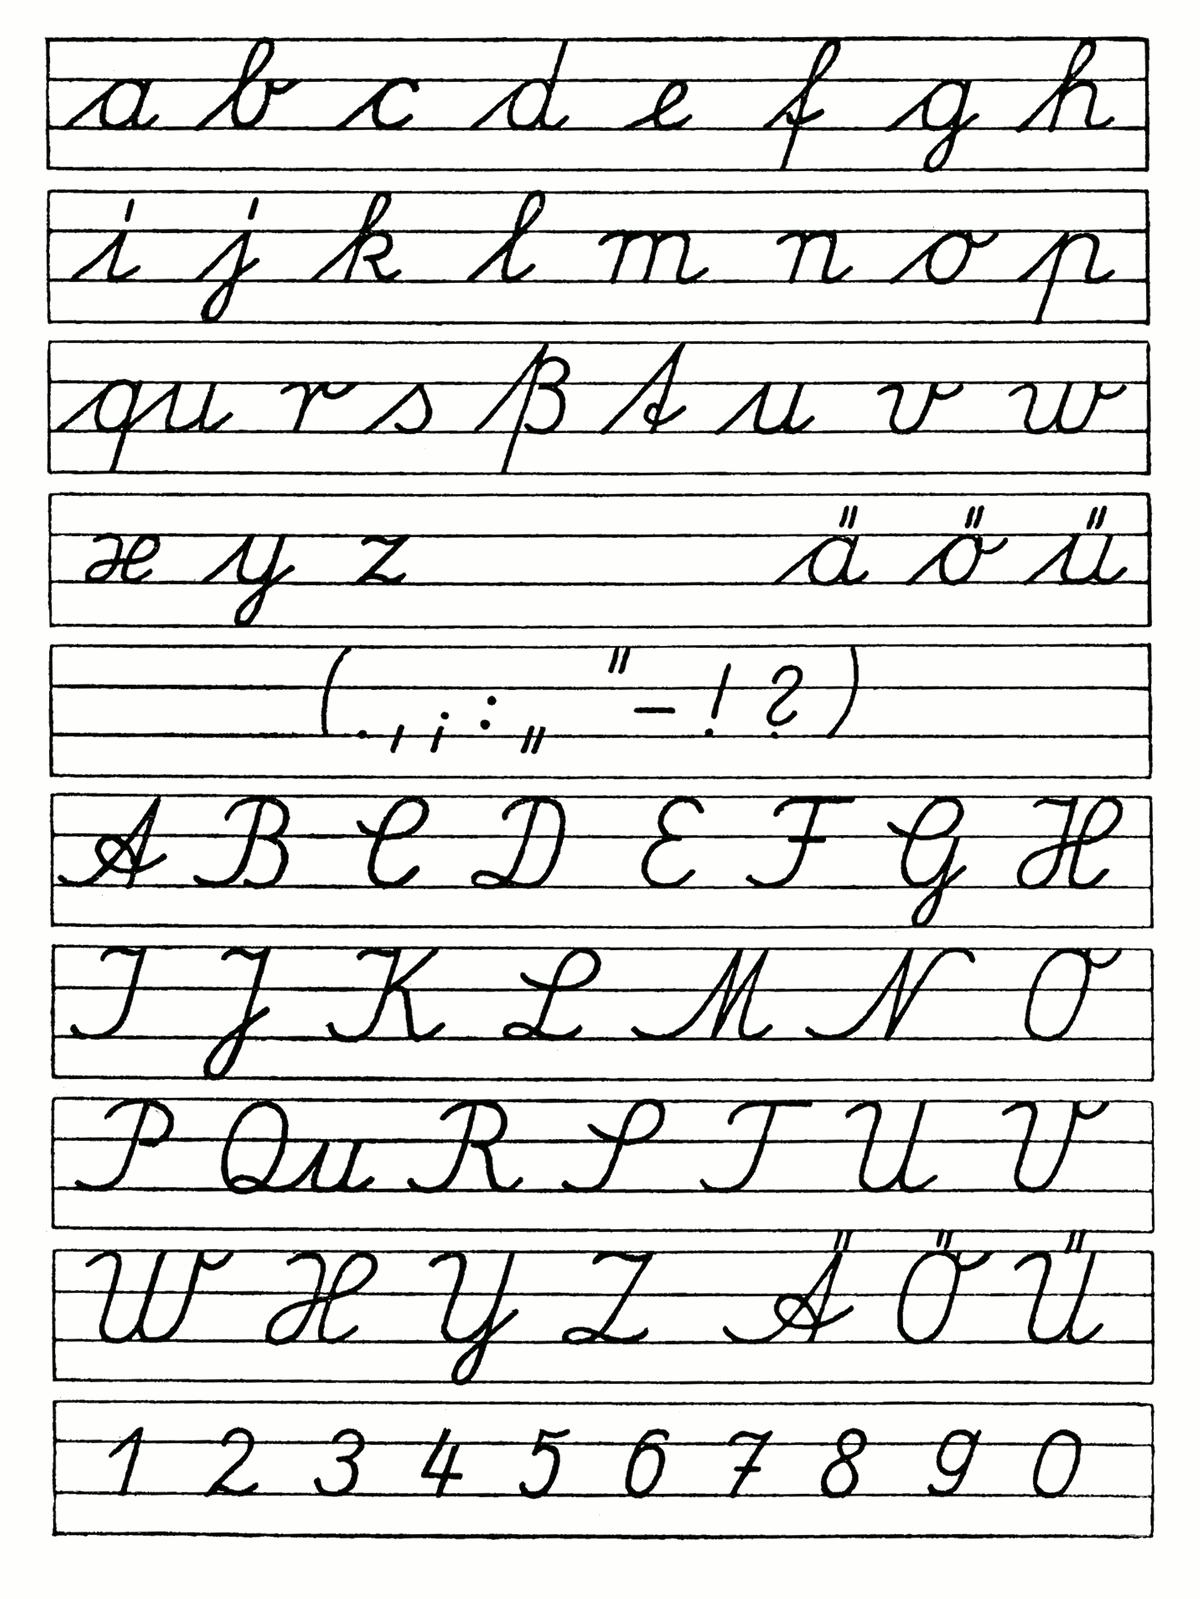 How to improve my English cursive writing - Quora